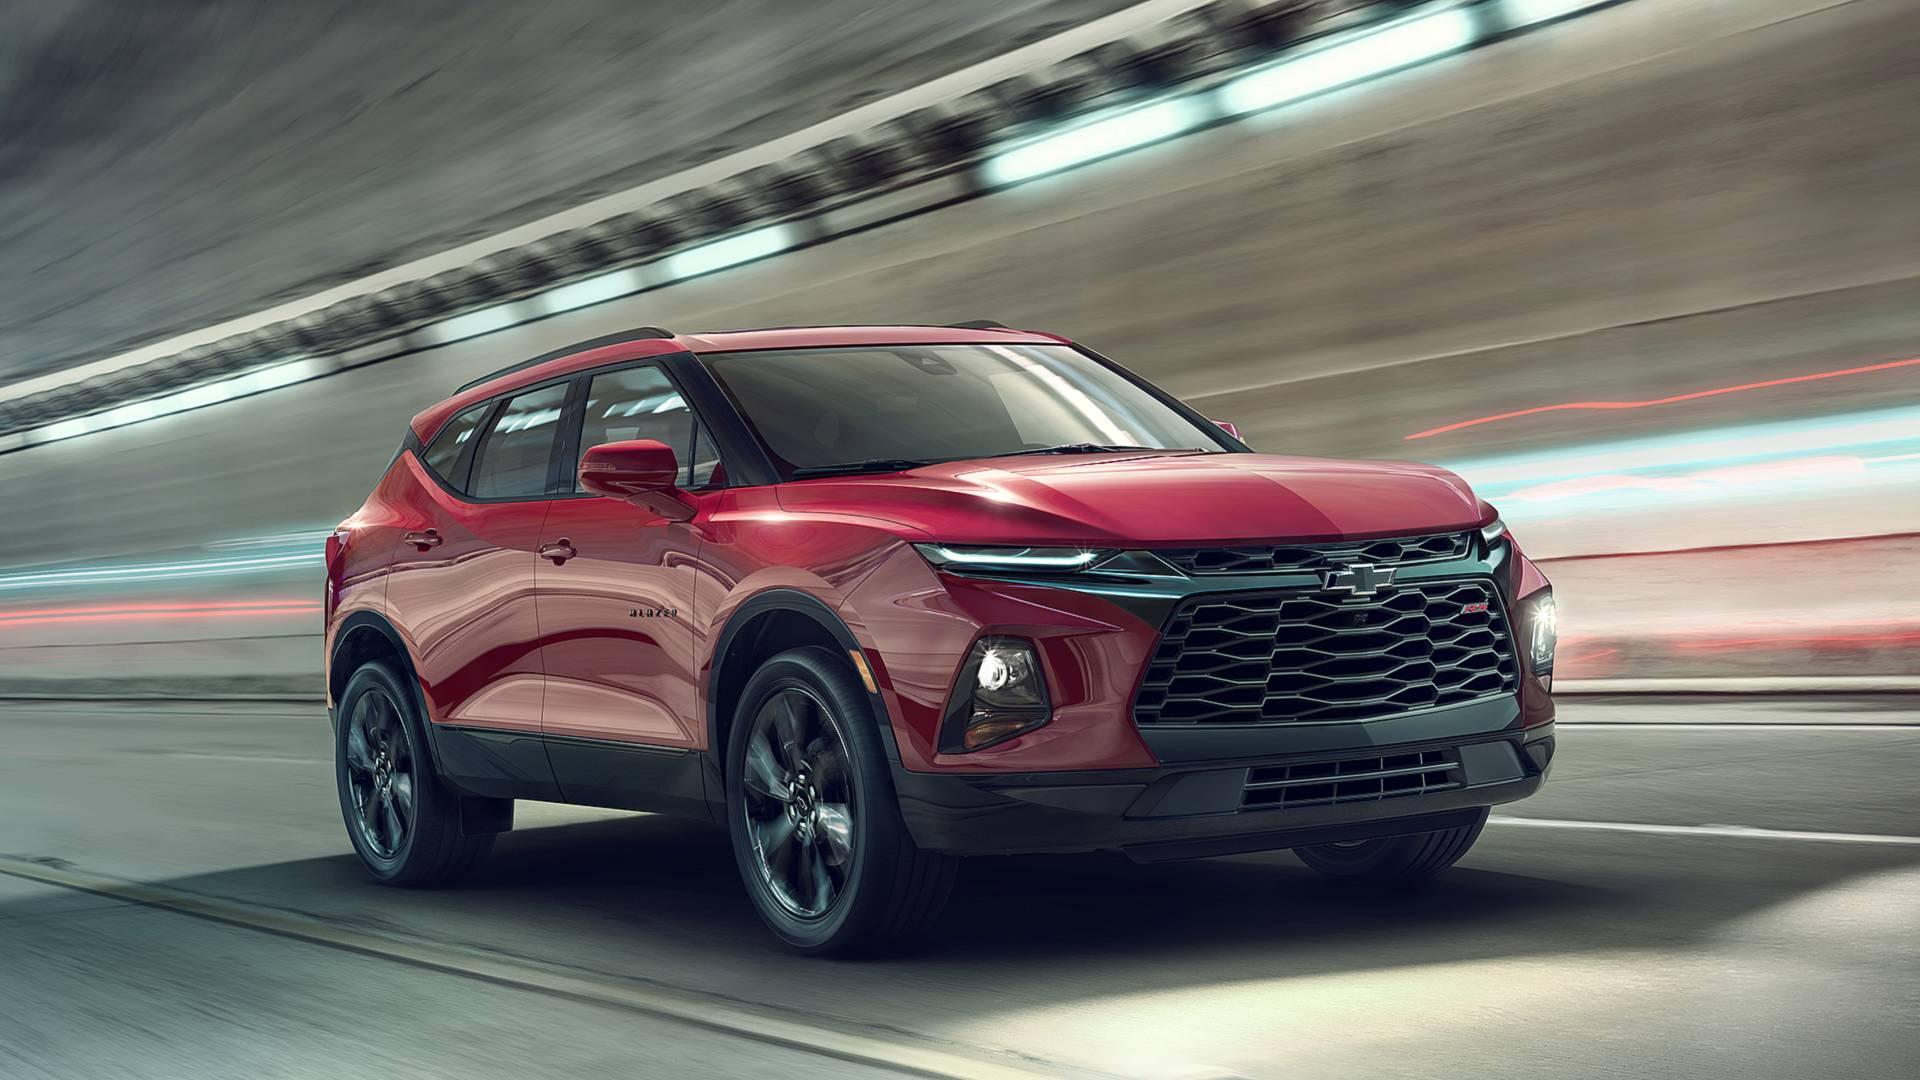 2019 Chevrolet Blazer is the Camaro SUV that Proves SUVs ...